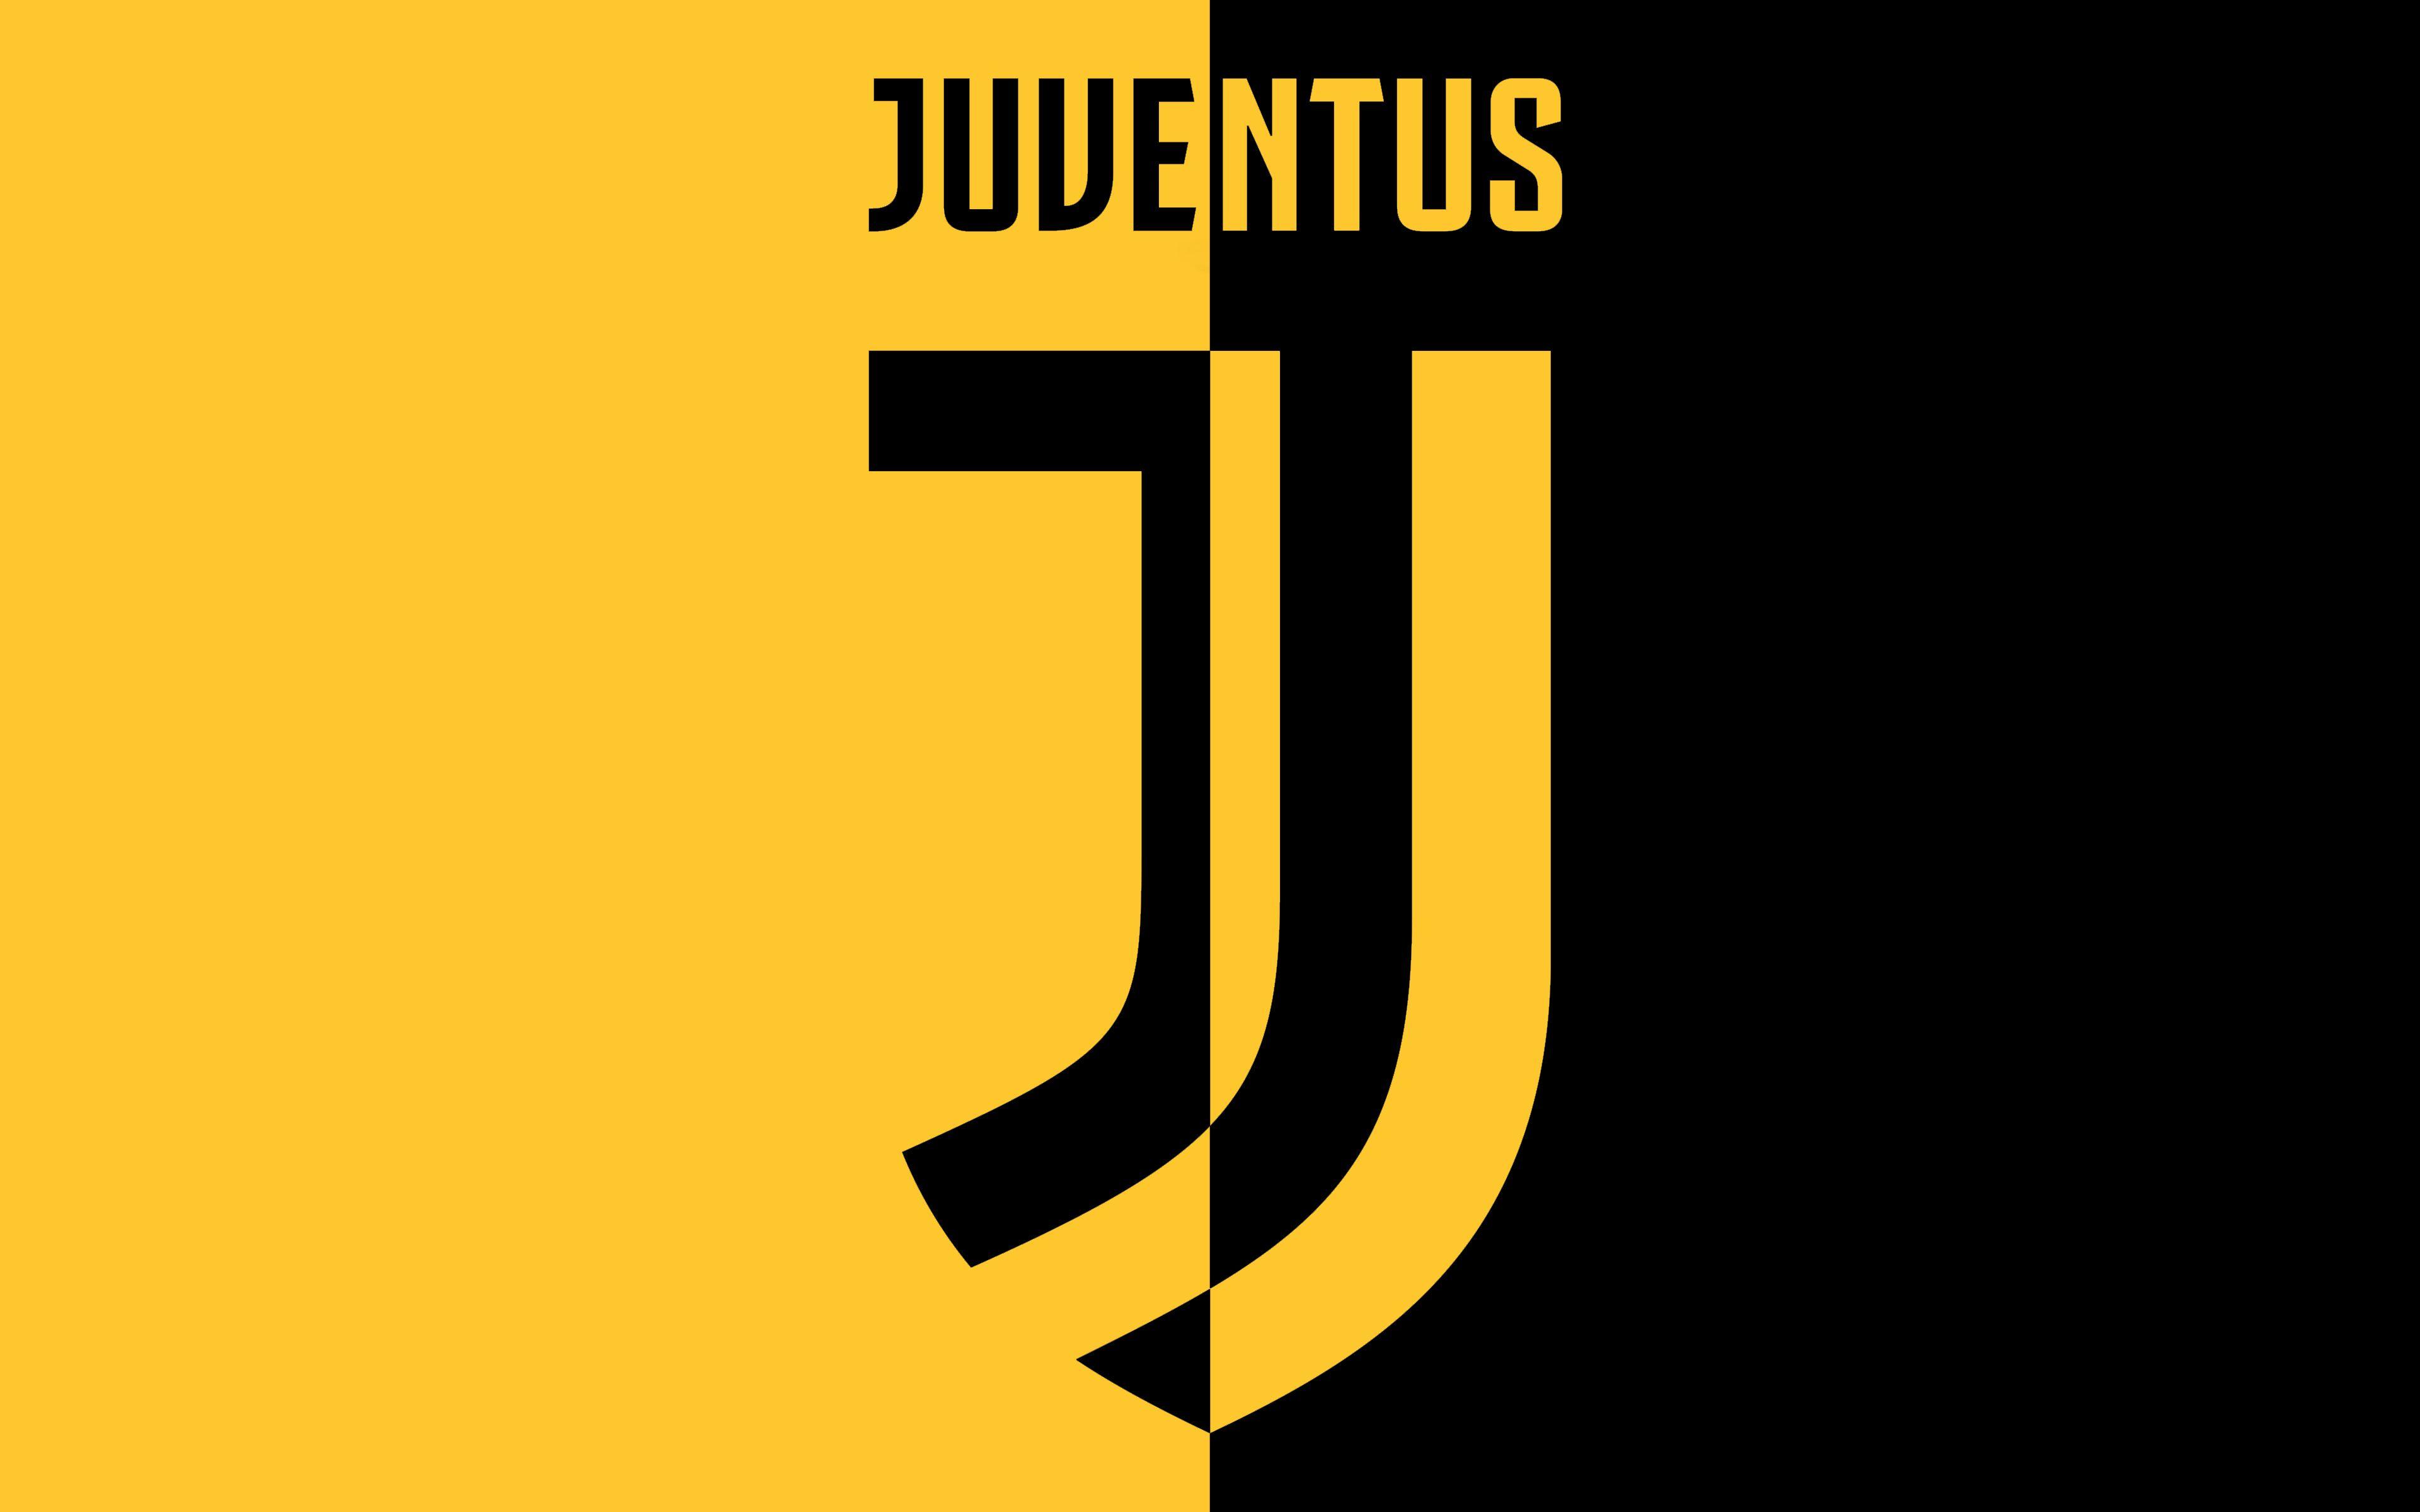 Juventus Wallpaper New Logo Labzada Wallpaper Alt Image Olahraga Sepak Bola Wallpaper Ponsel